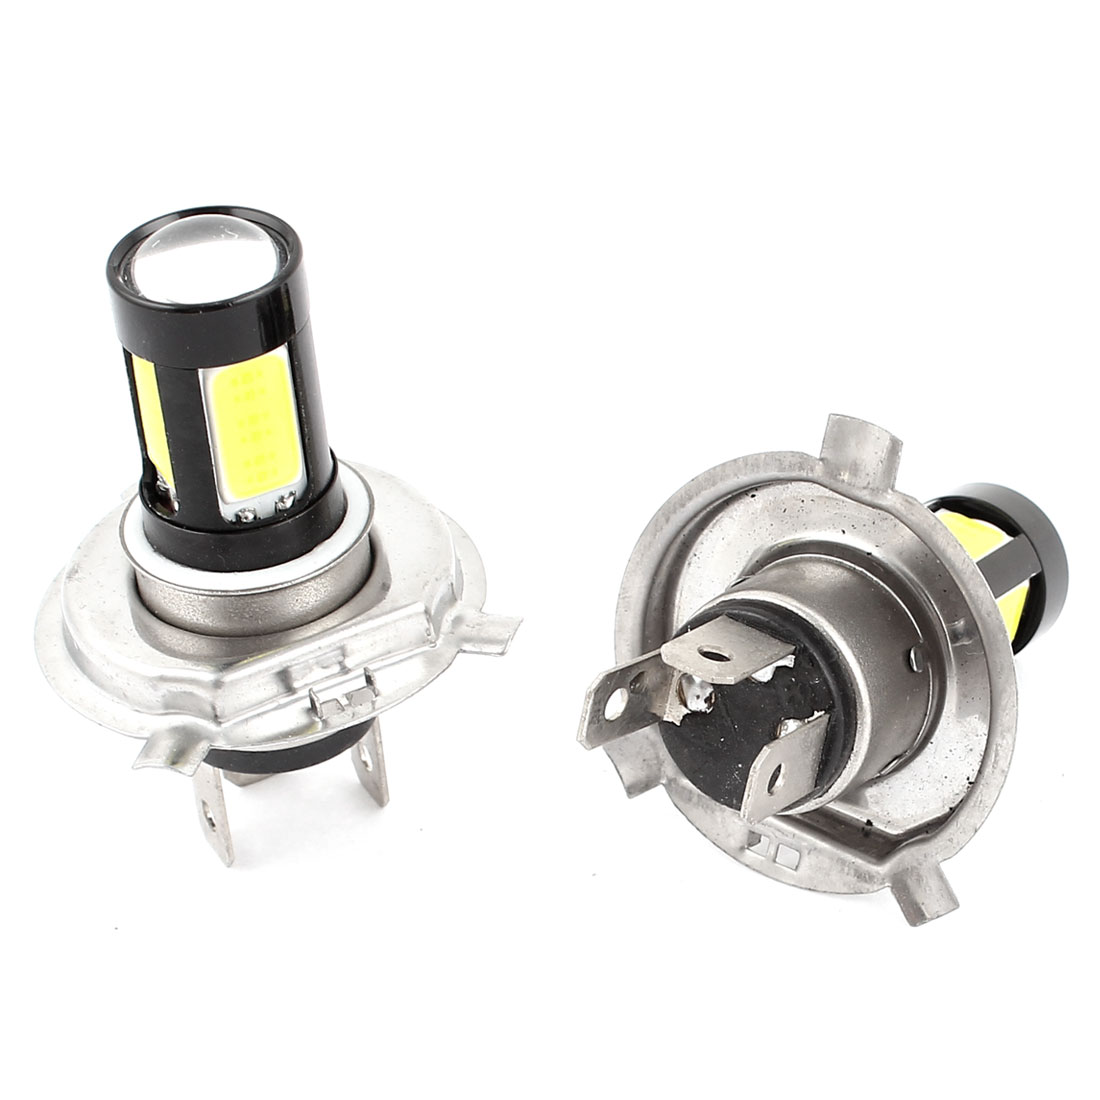 Car 5 COB LED H4 DRL Daytime Driving Light Foglamp Head Lamp White 2 Pcs